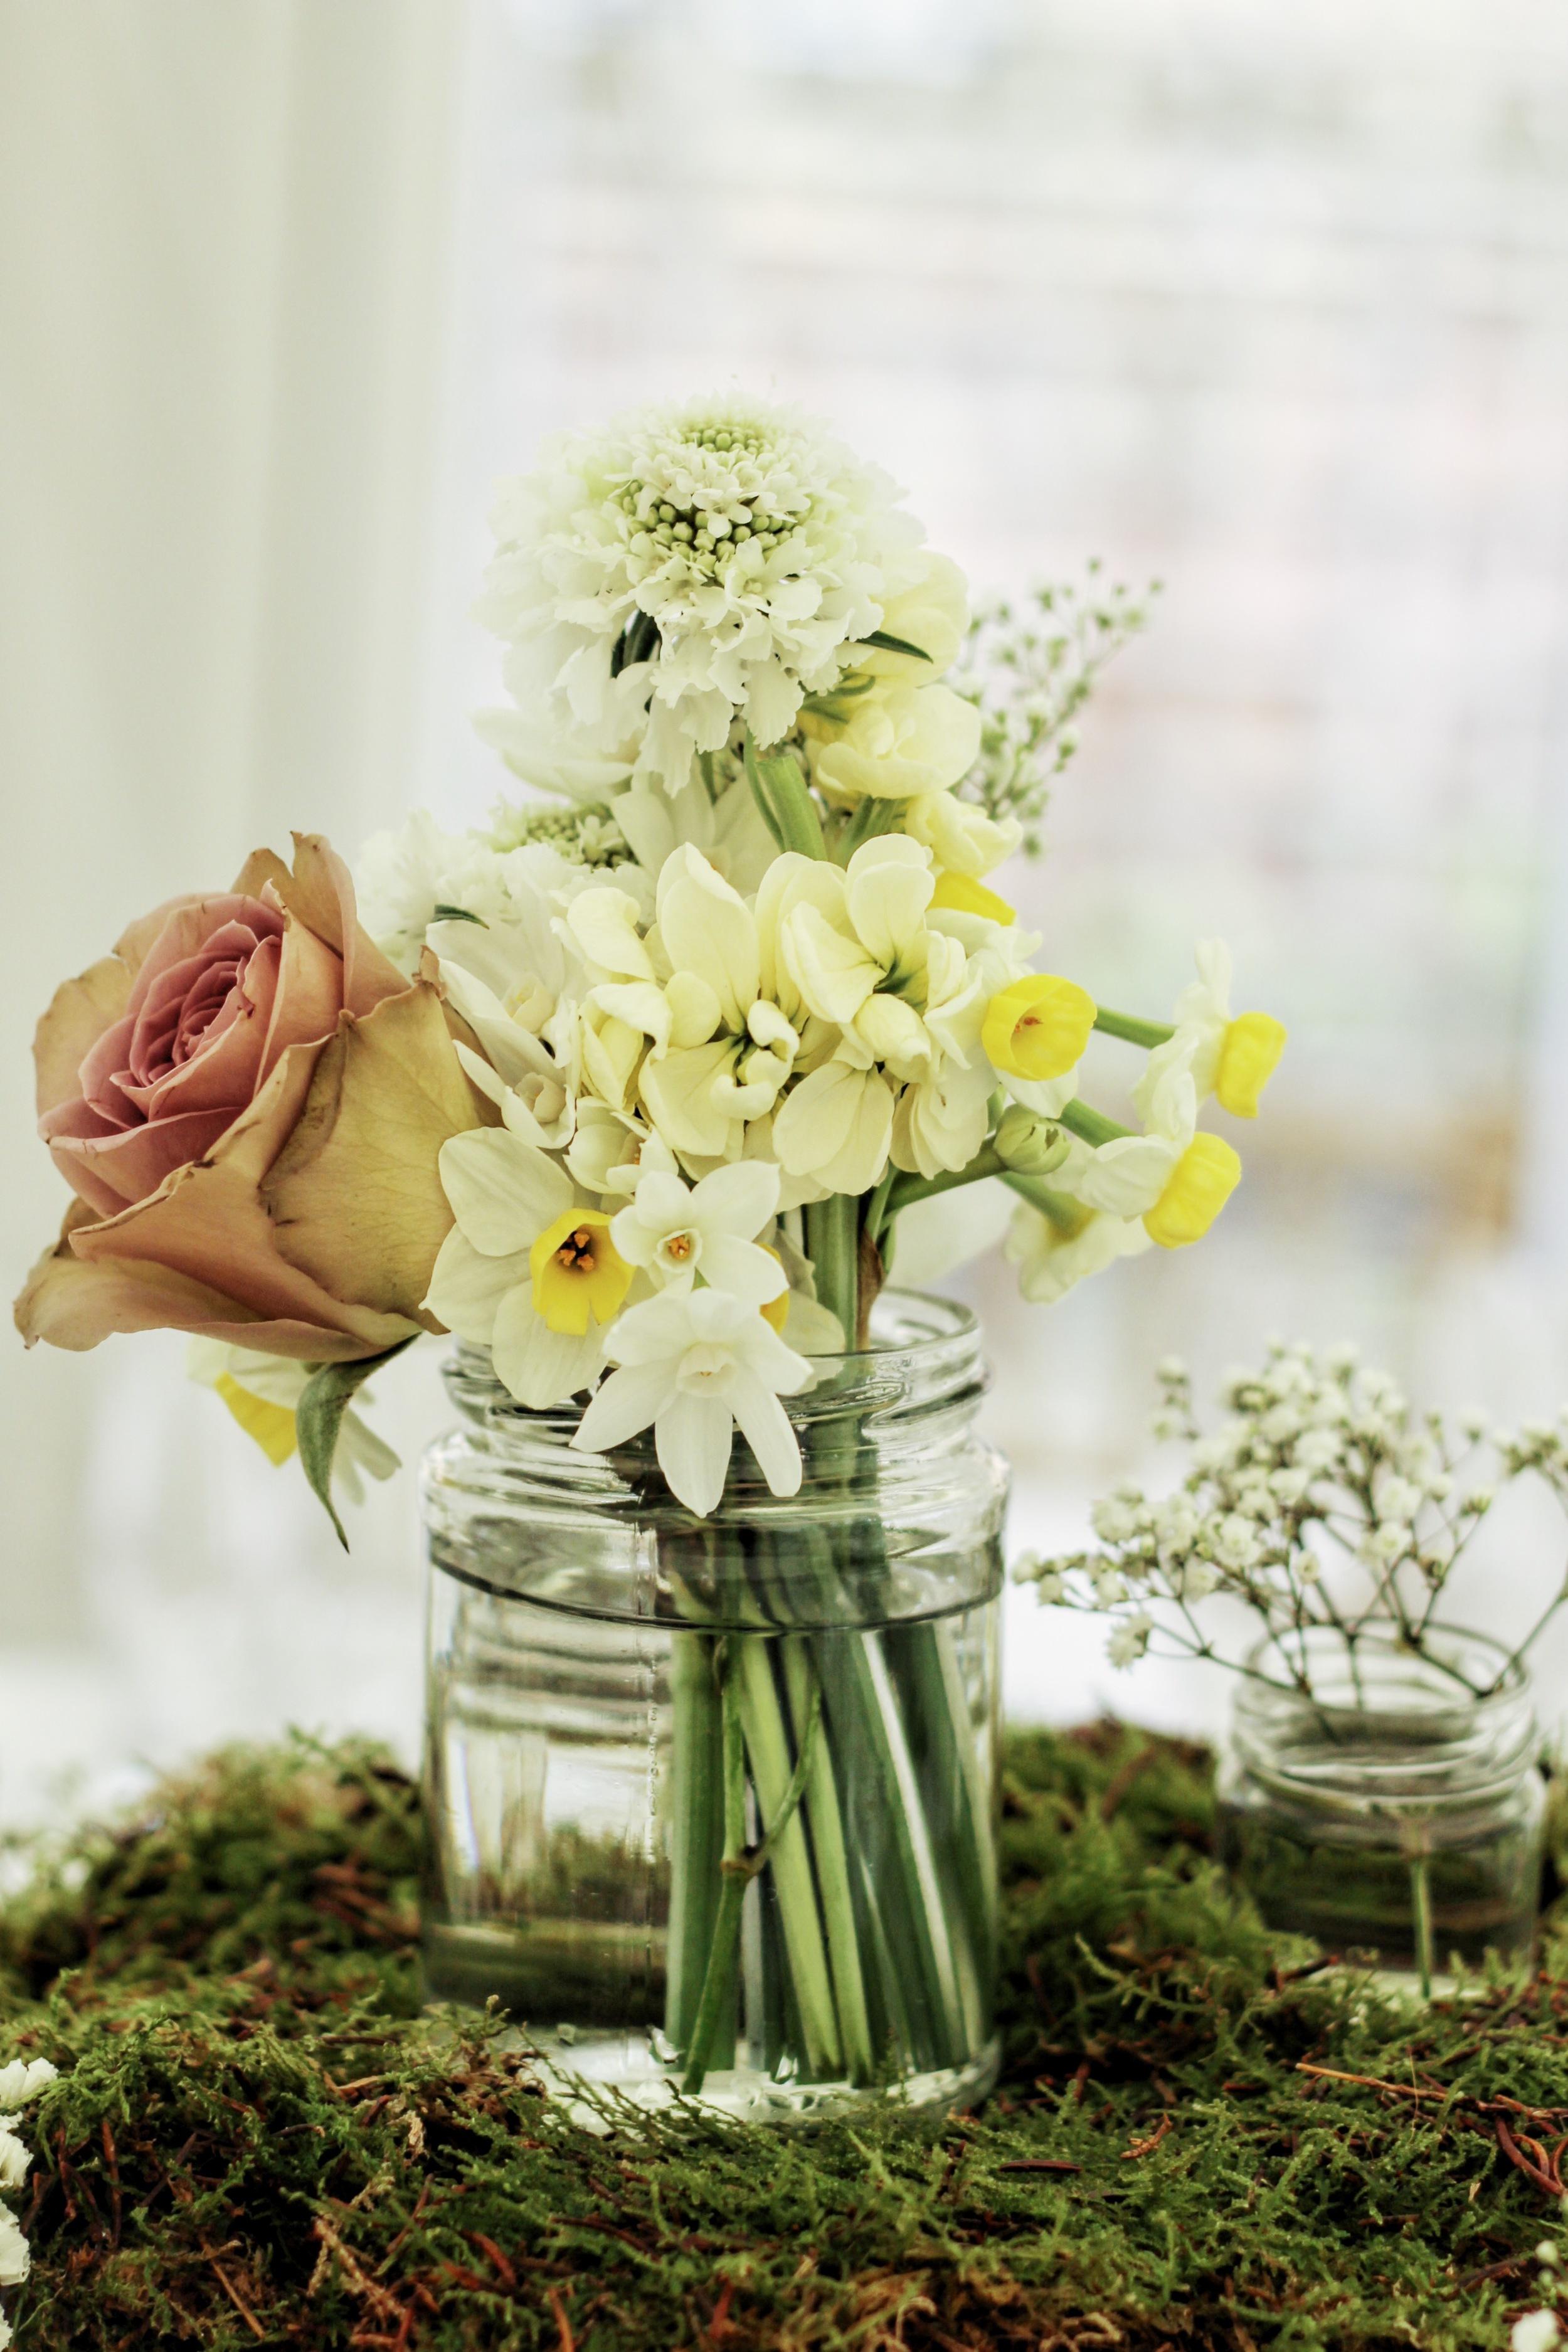 jam jar flowers by Jennifer Pinder on a moss boss for a spring wedding.JPG